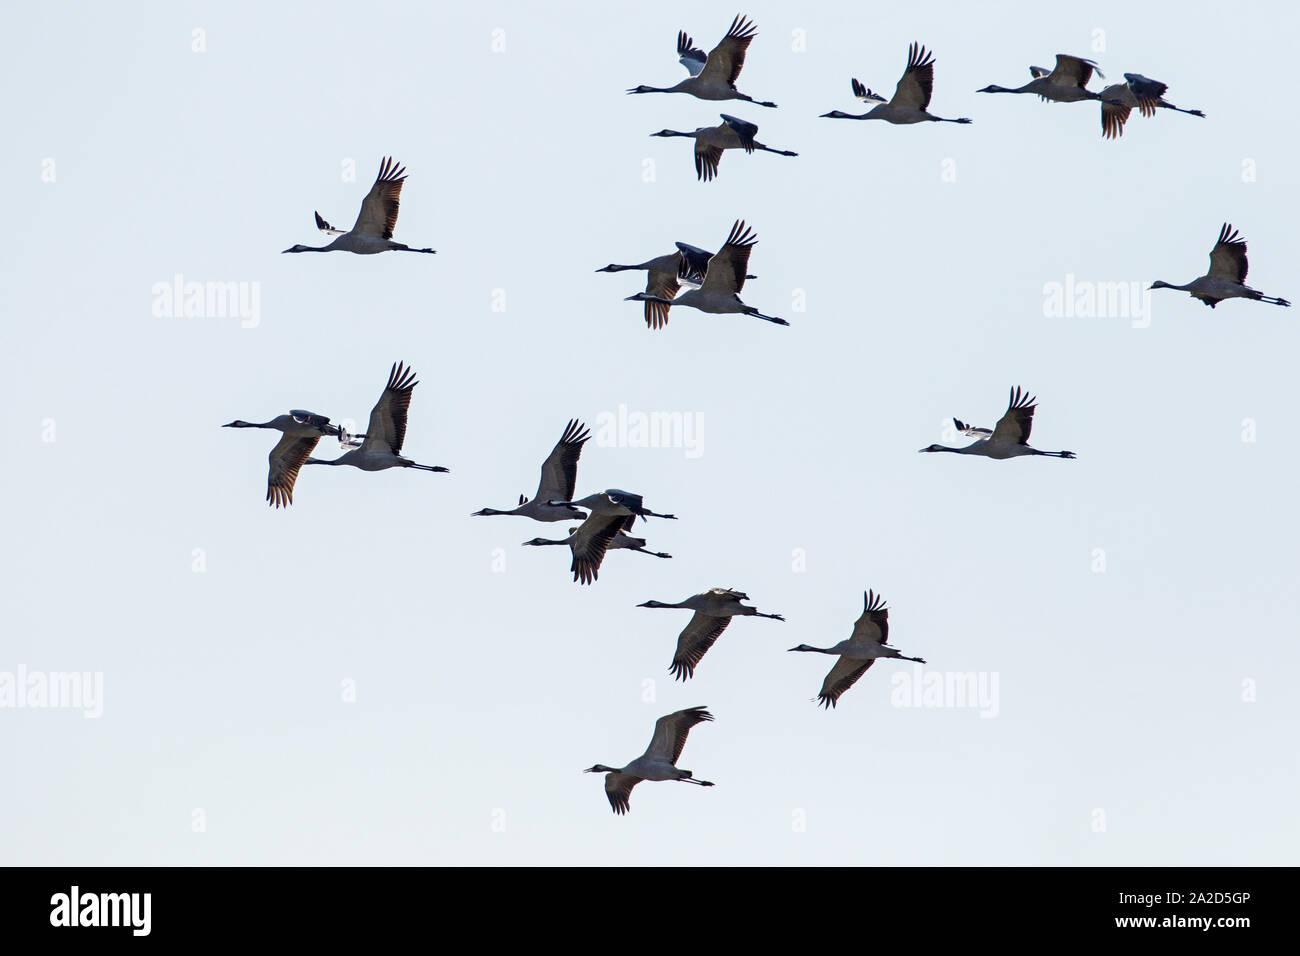 Flock of Common Crane (Grus grus) in flight as silhouettes, Welney, Norfolk, England Stock Photo